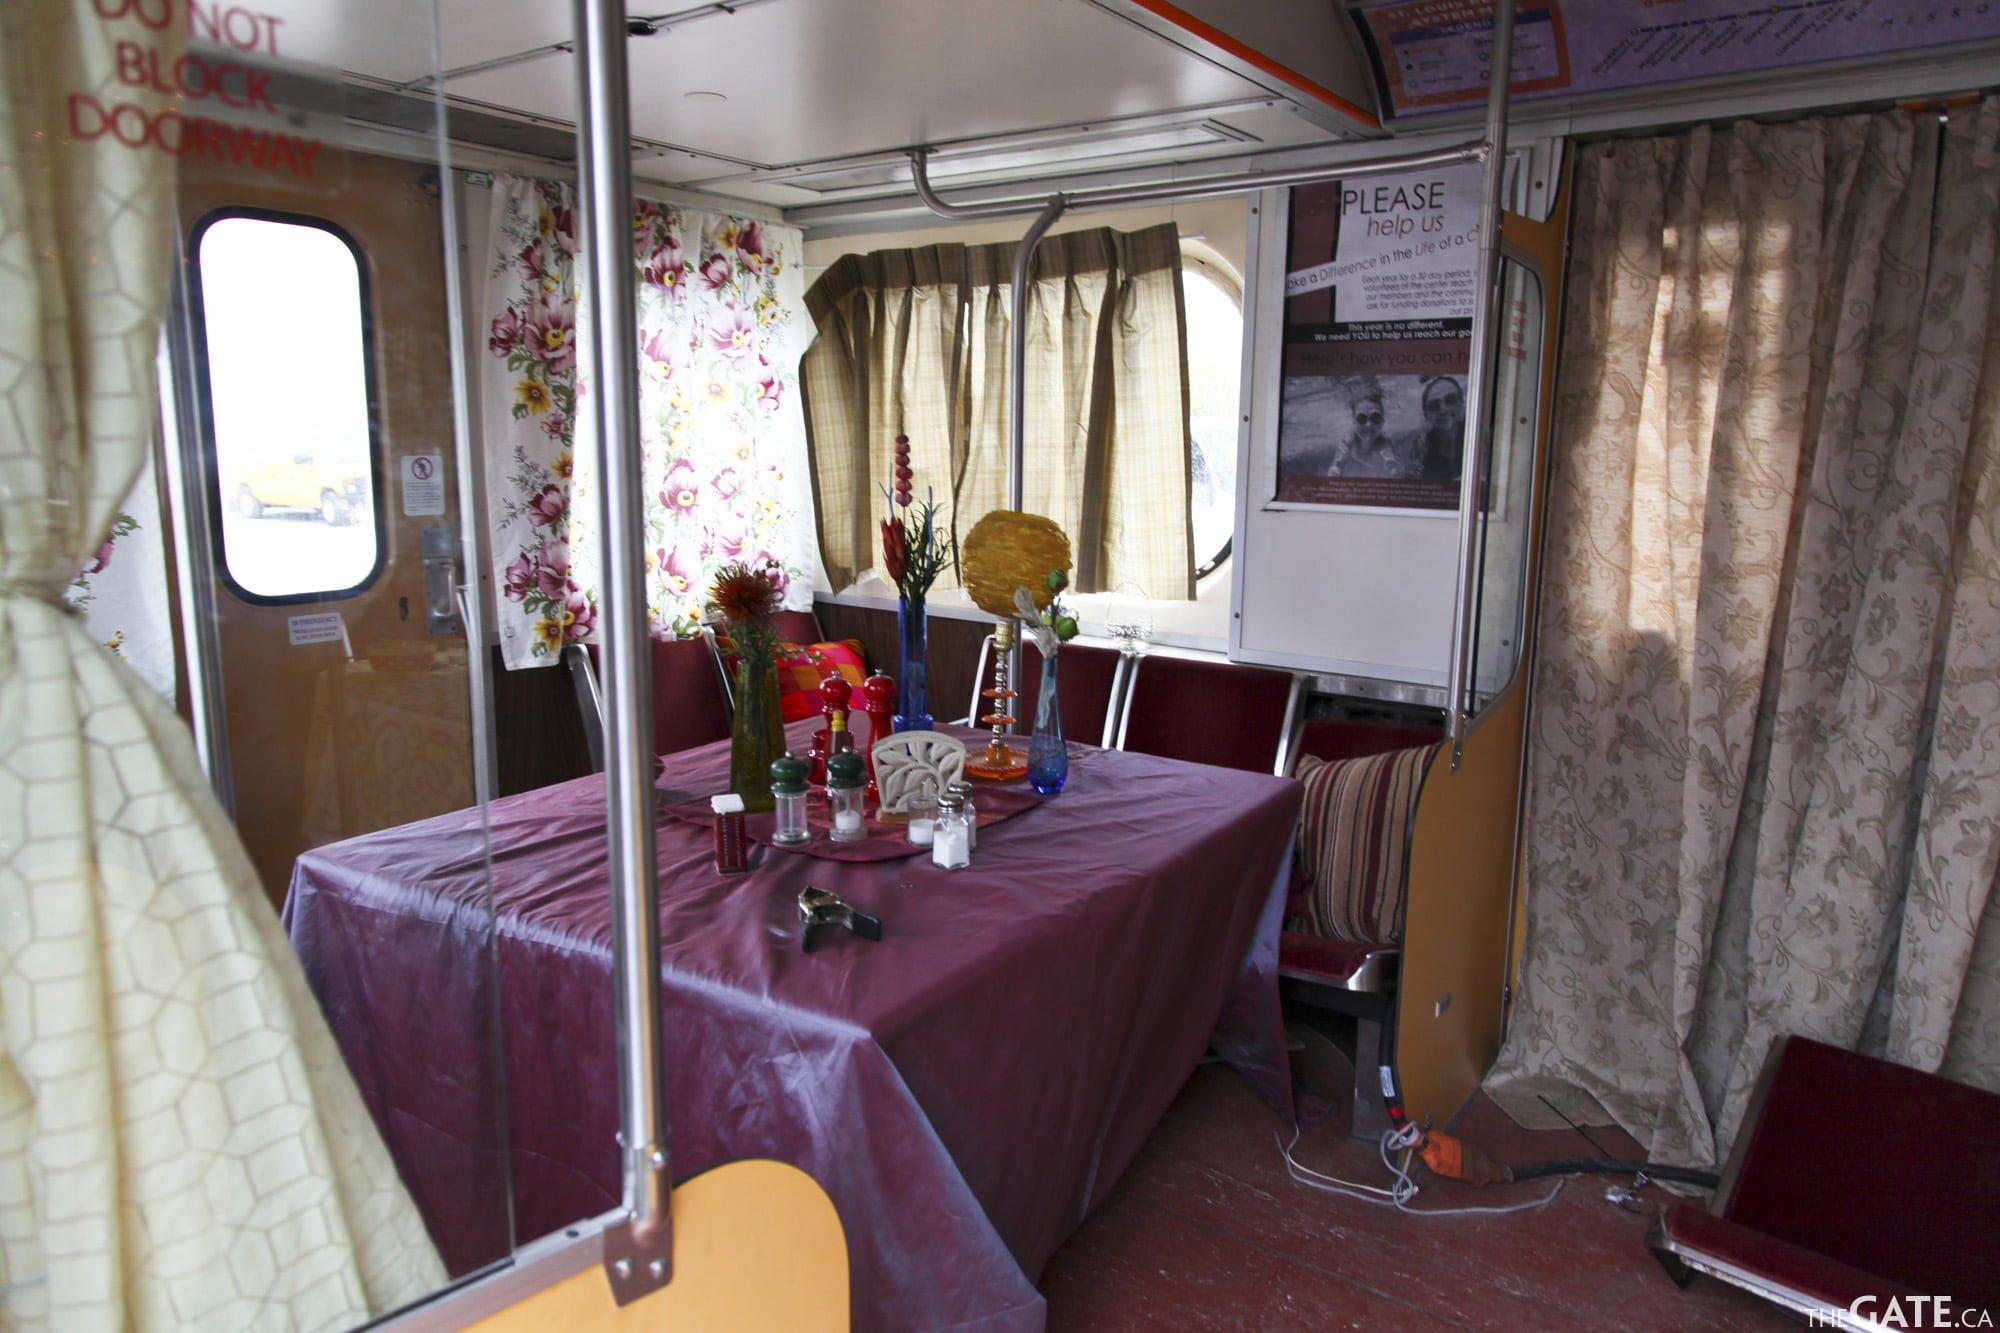 Inside the train cafe